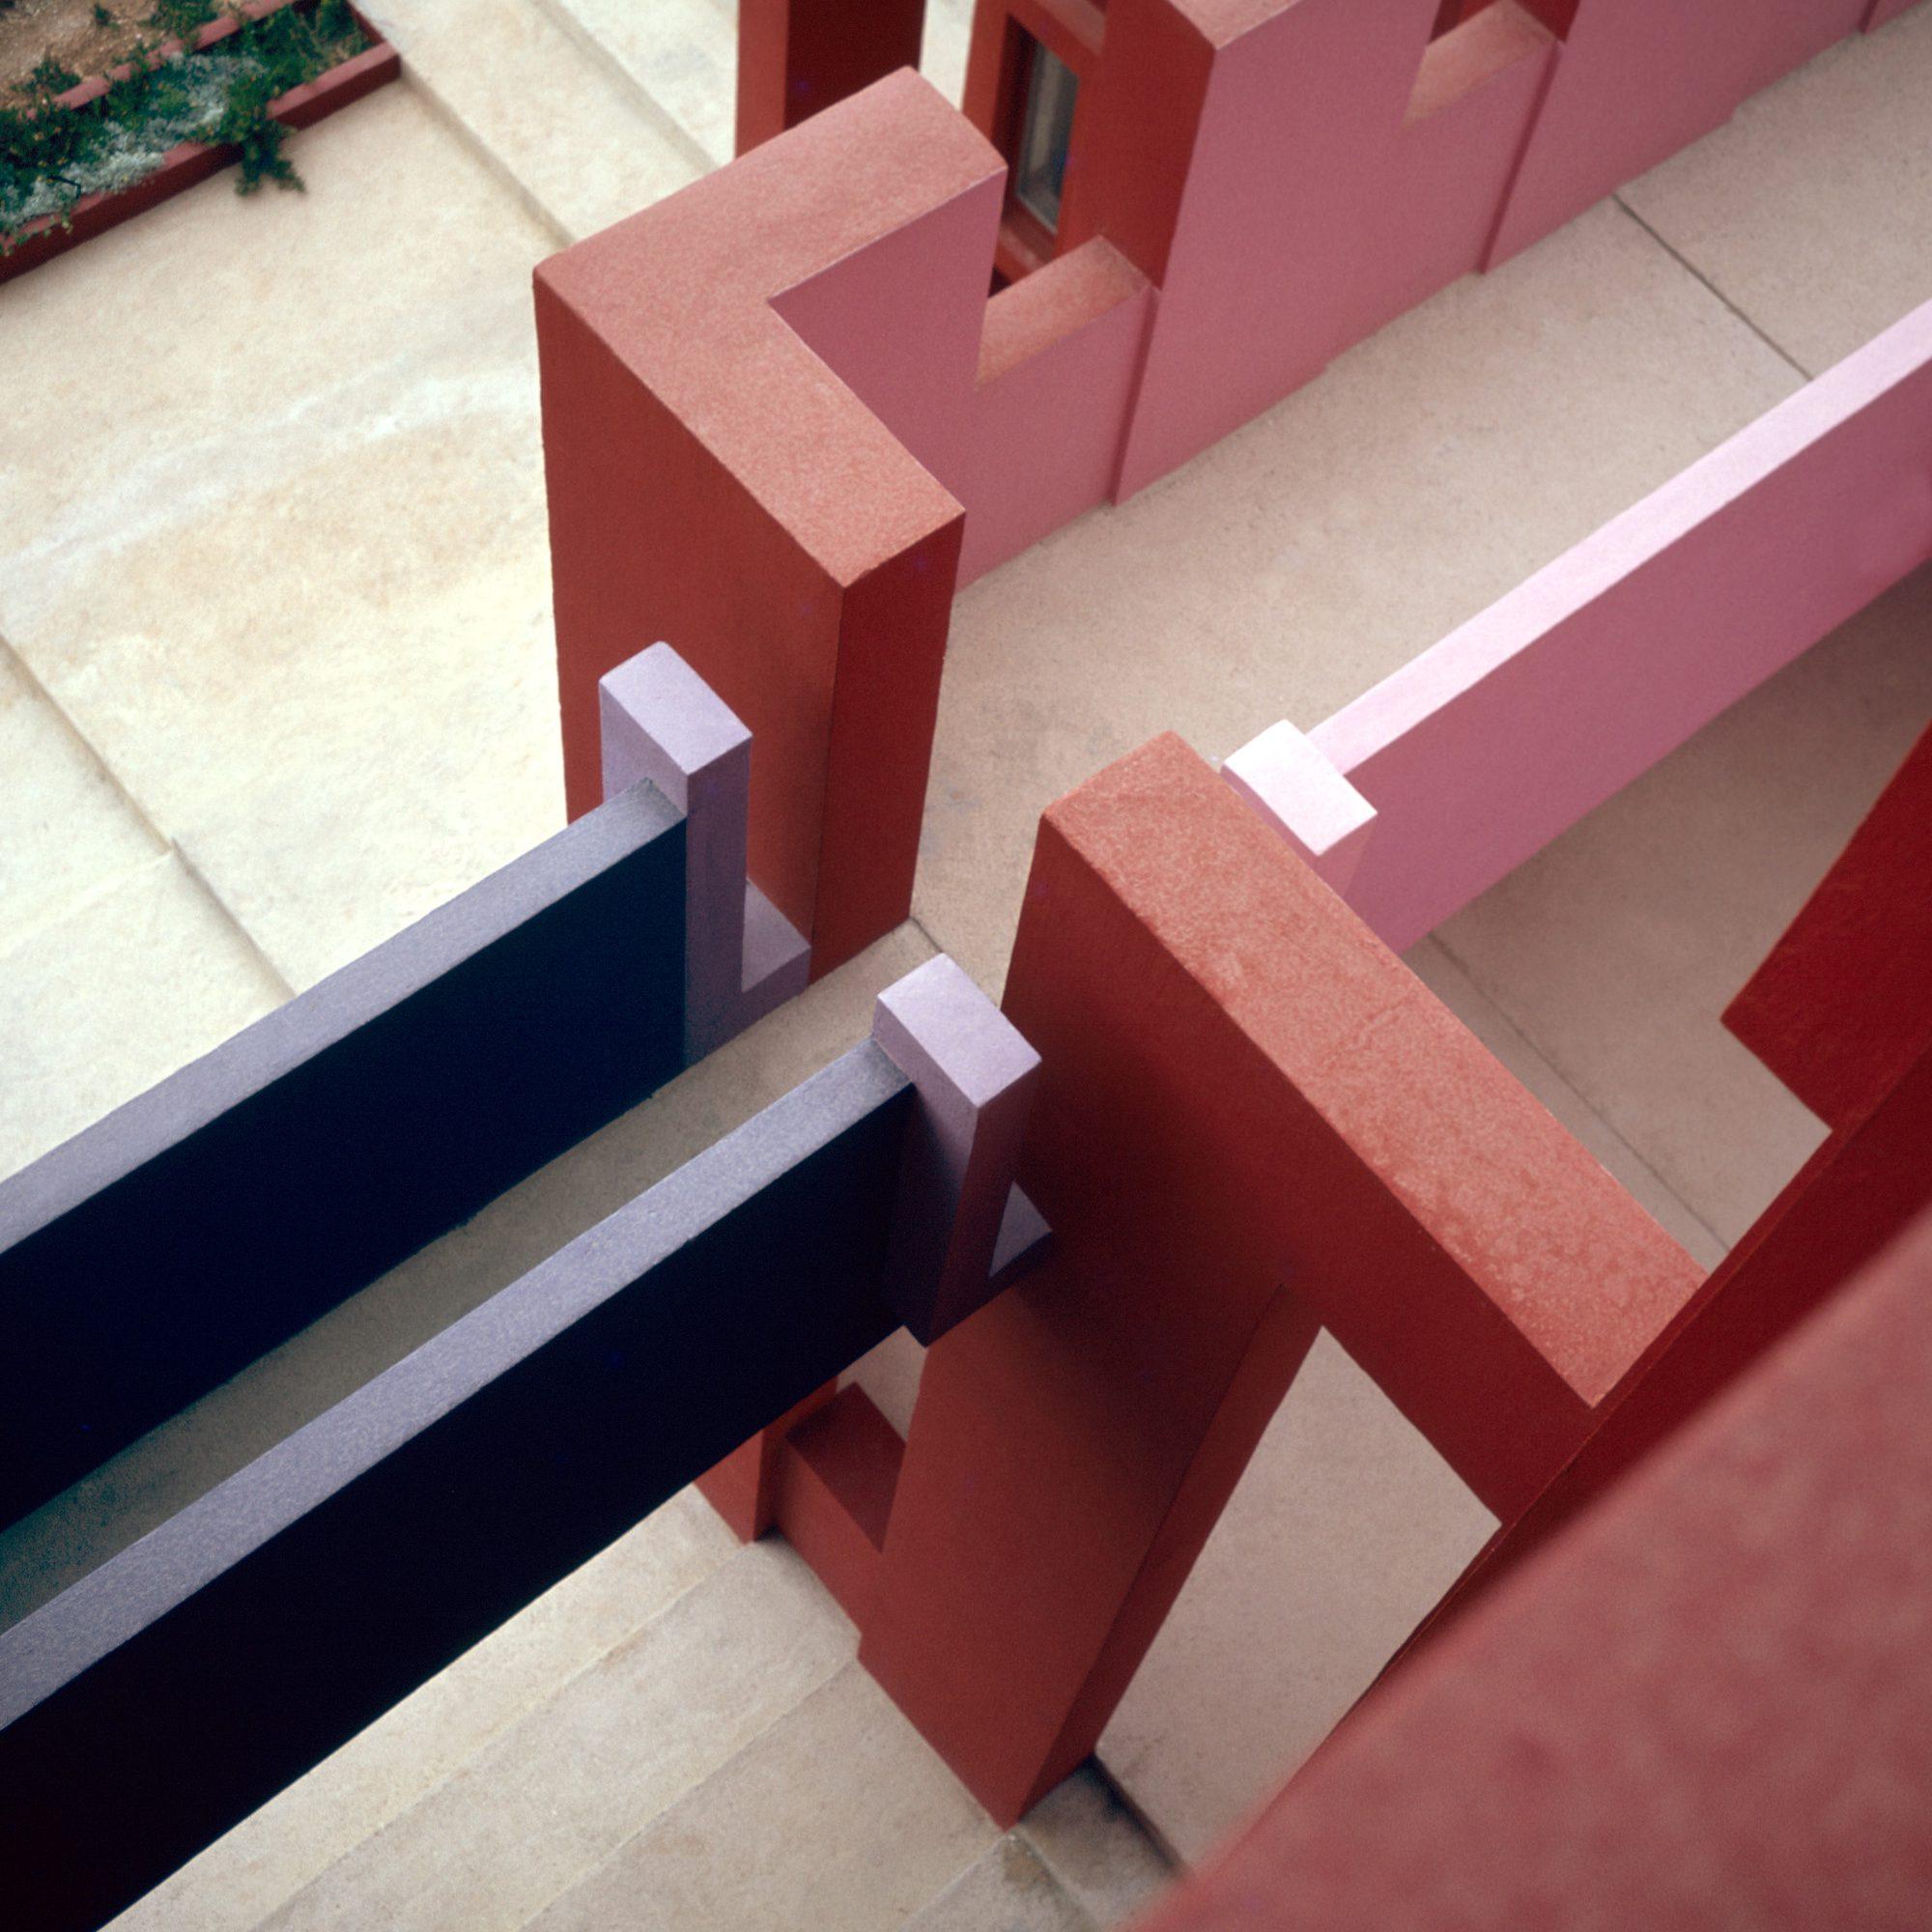 Ricardo_Bofill_Taller_de_Arquitectura_La_Muralla_Roja_Calpe_Spain_(2)